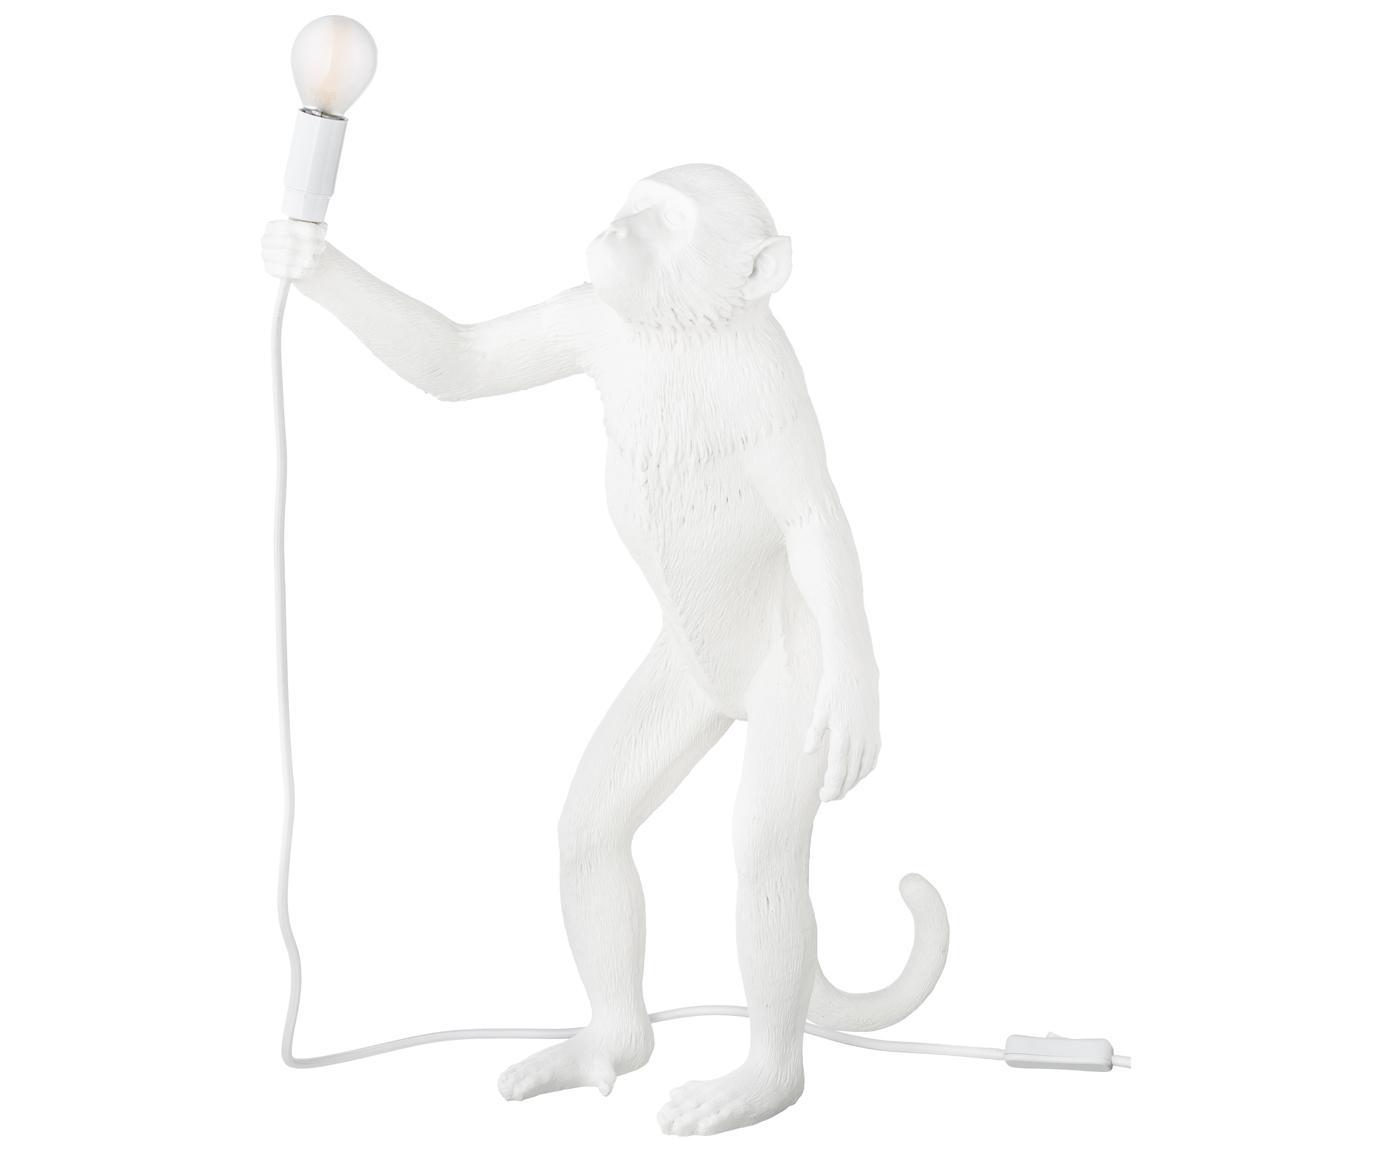 Lampada da tavolo a LED Monkey, Resina, Bianco, Larg. 46 x Alt. 54 cm